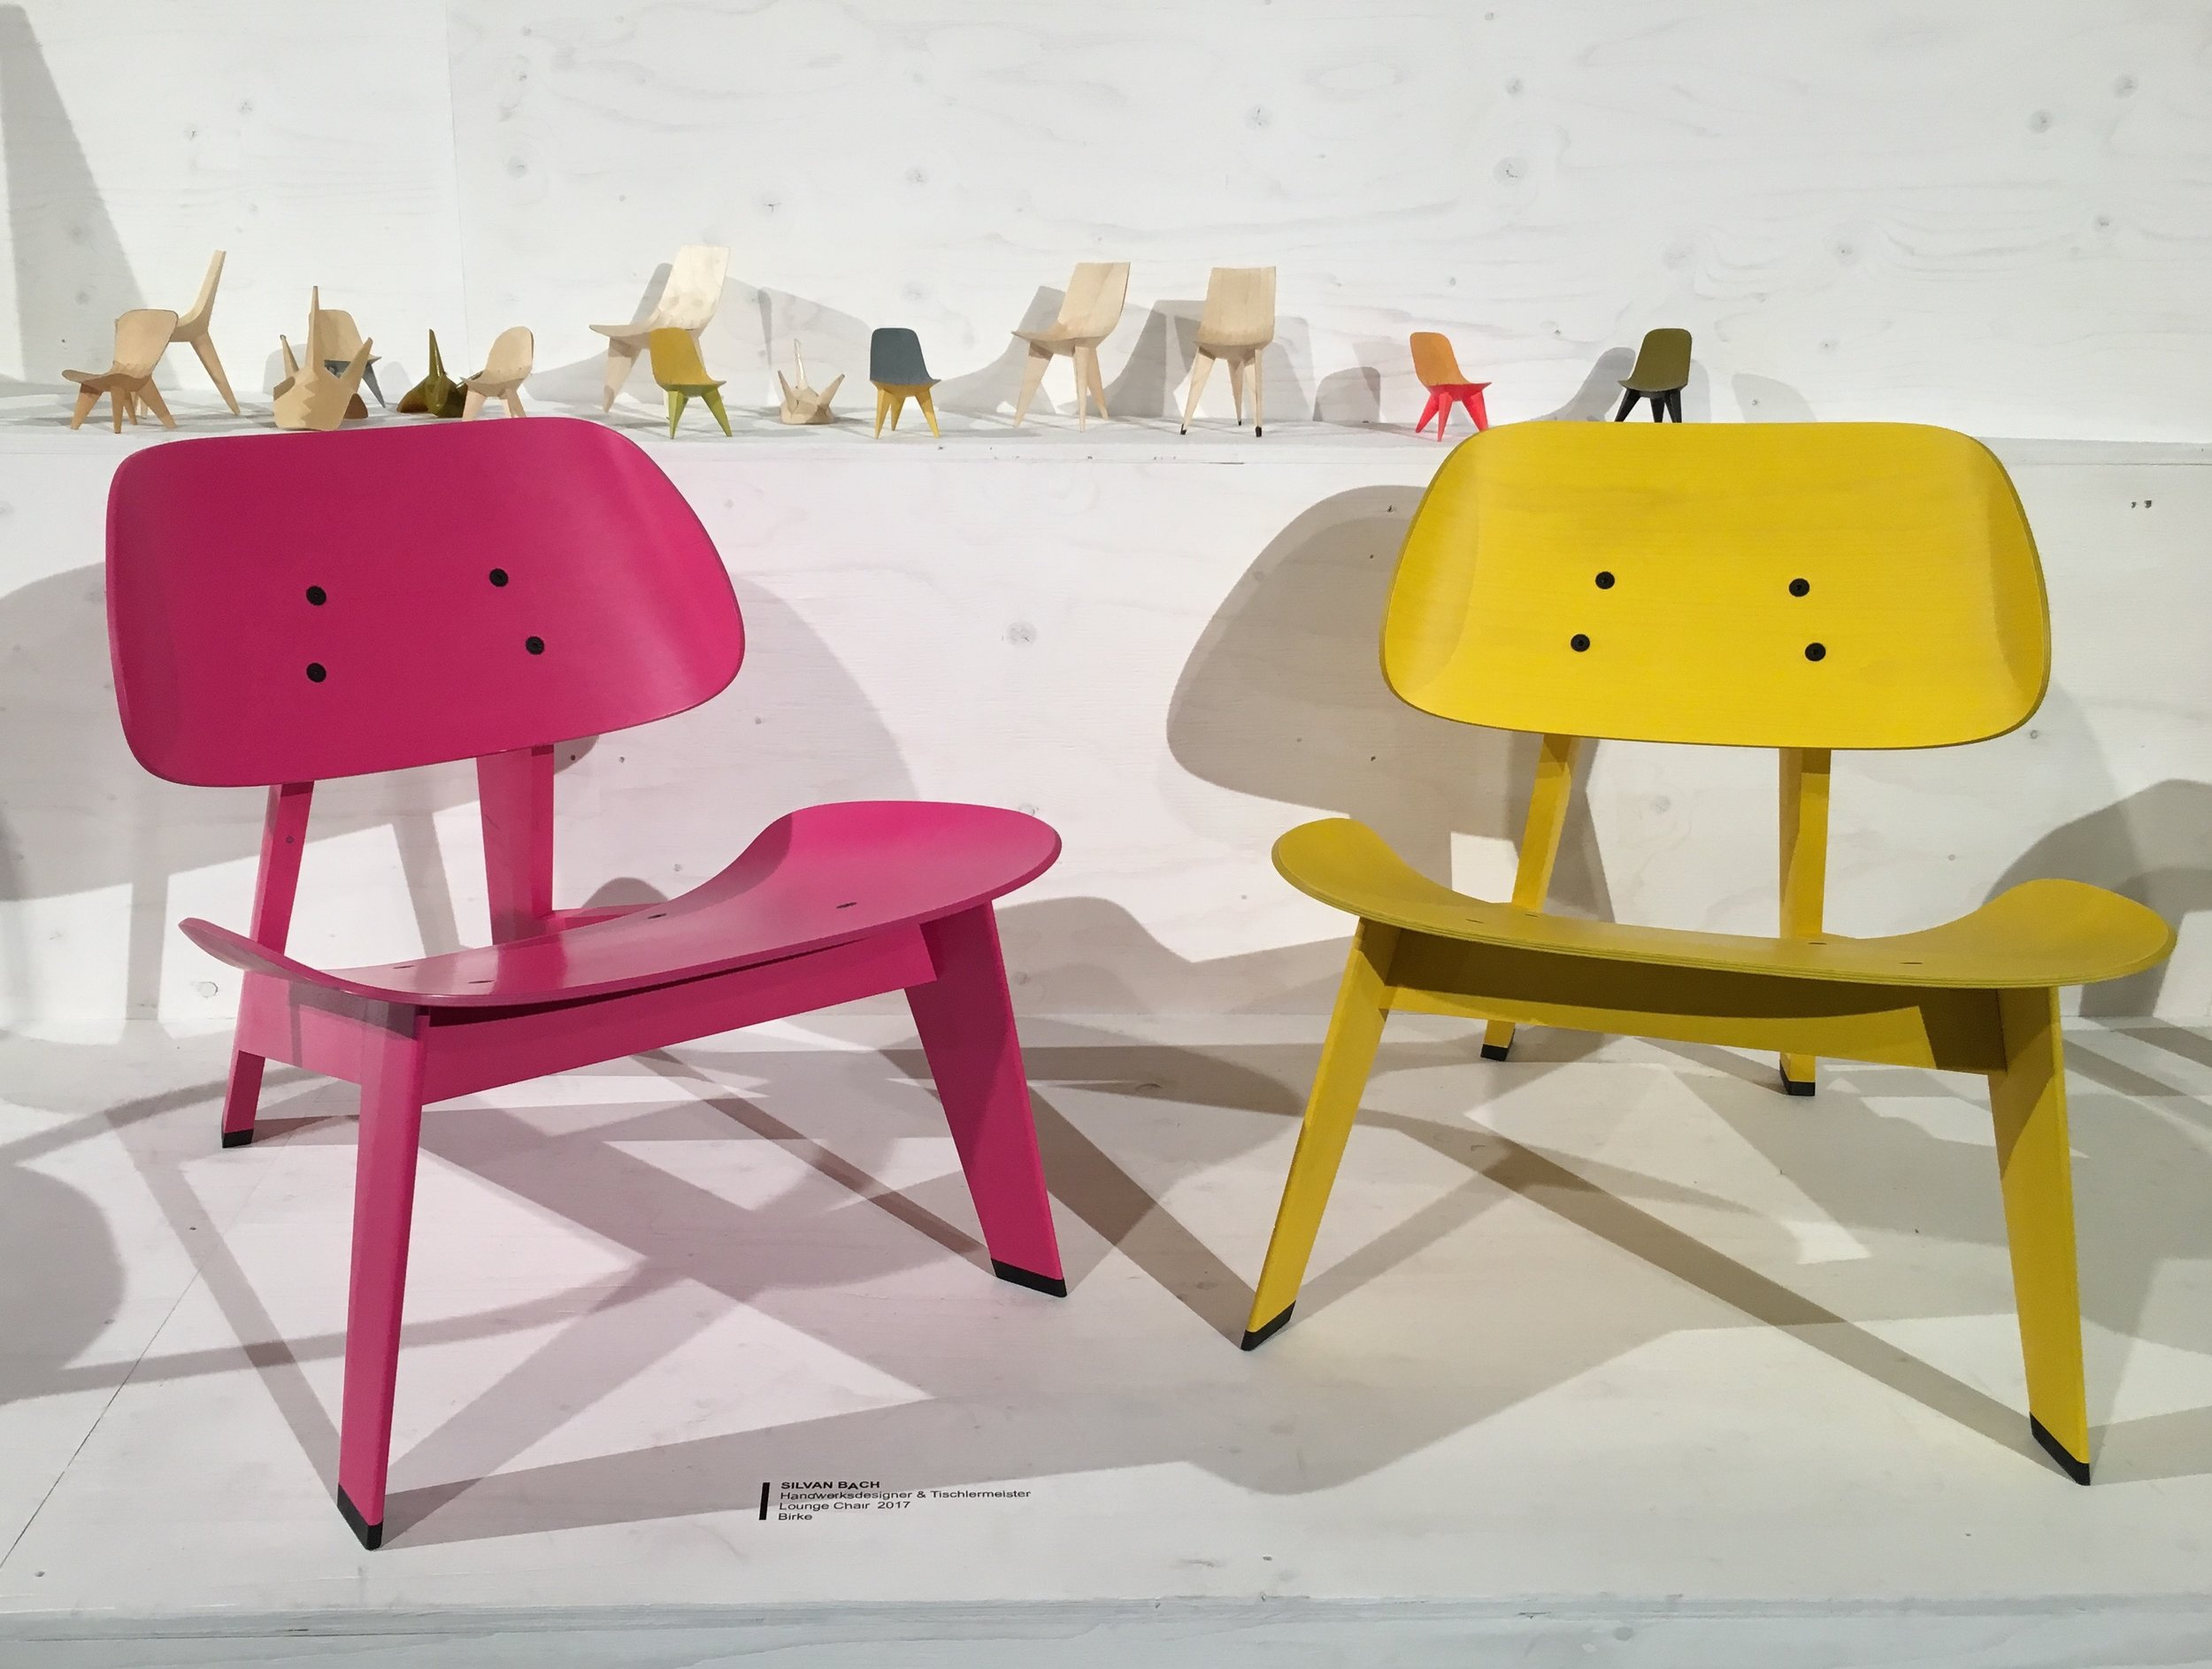 Stuhlentwürfe von Silvan Bach, Foto: U. Latzke